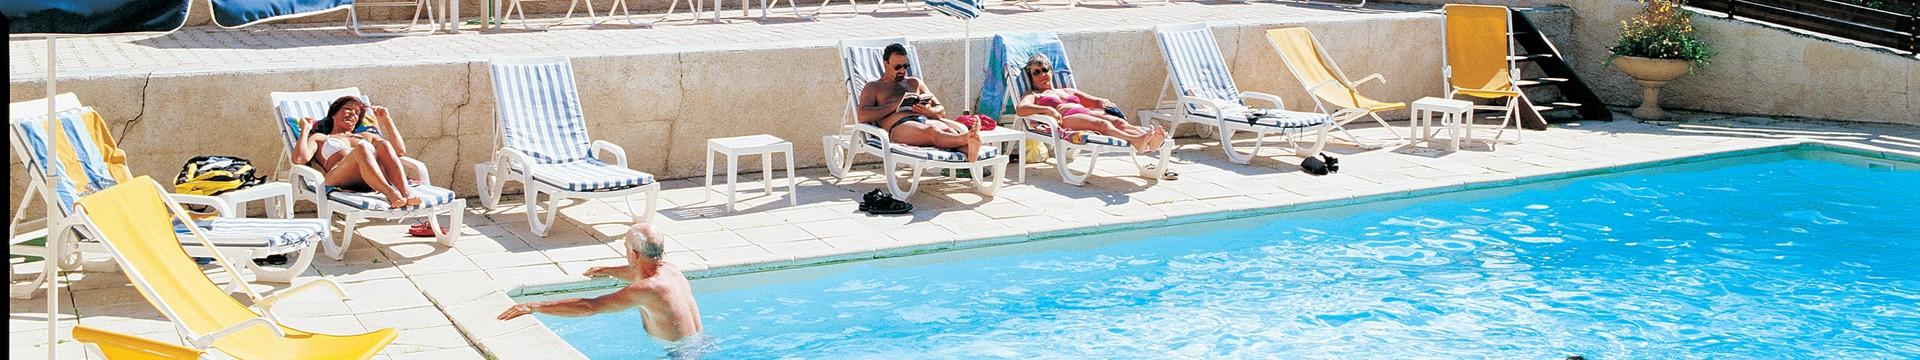 piscine-9195